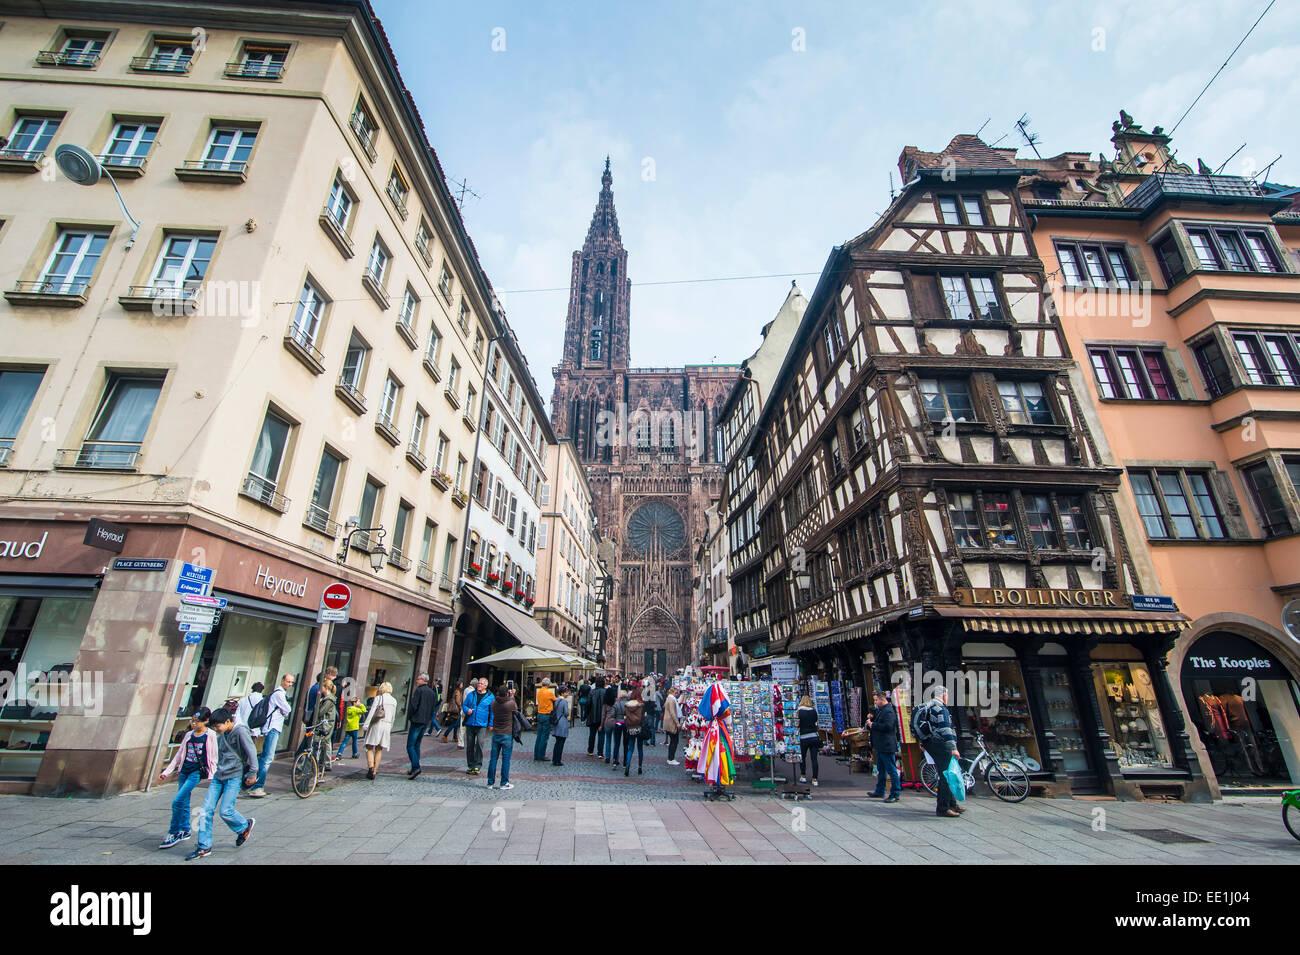 Rue Merciere, Strasbourg Cathedral, UNESCO World Heritage Site, Strasbourg, Alsace, France, Europe - Stock Image